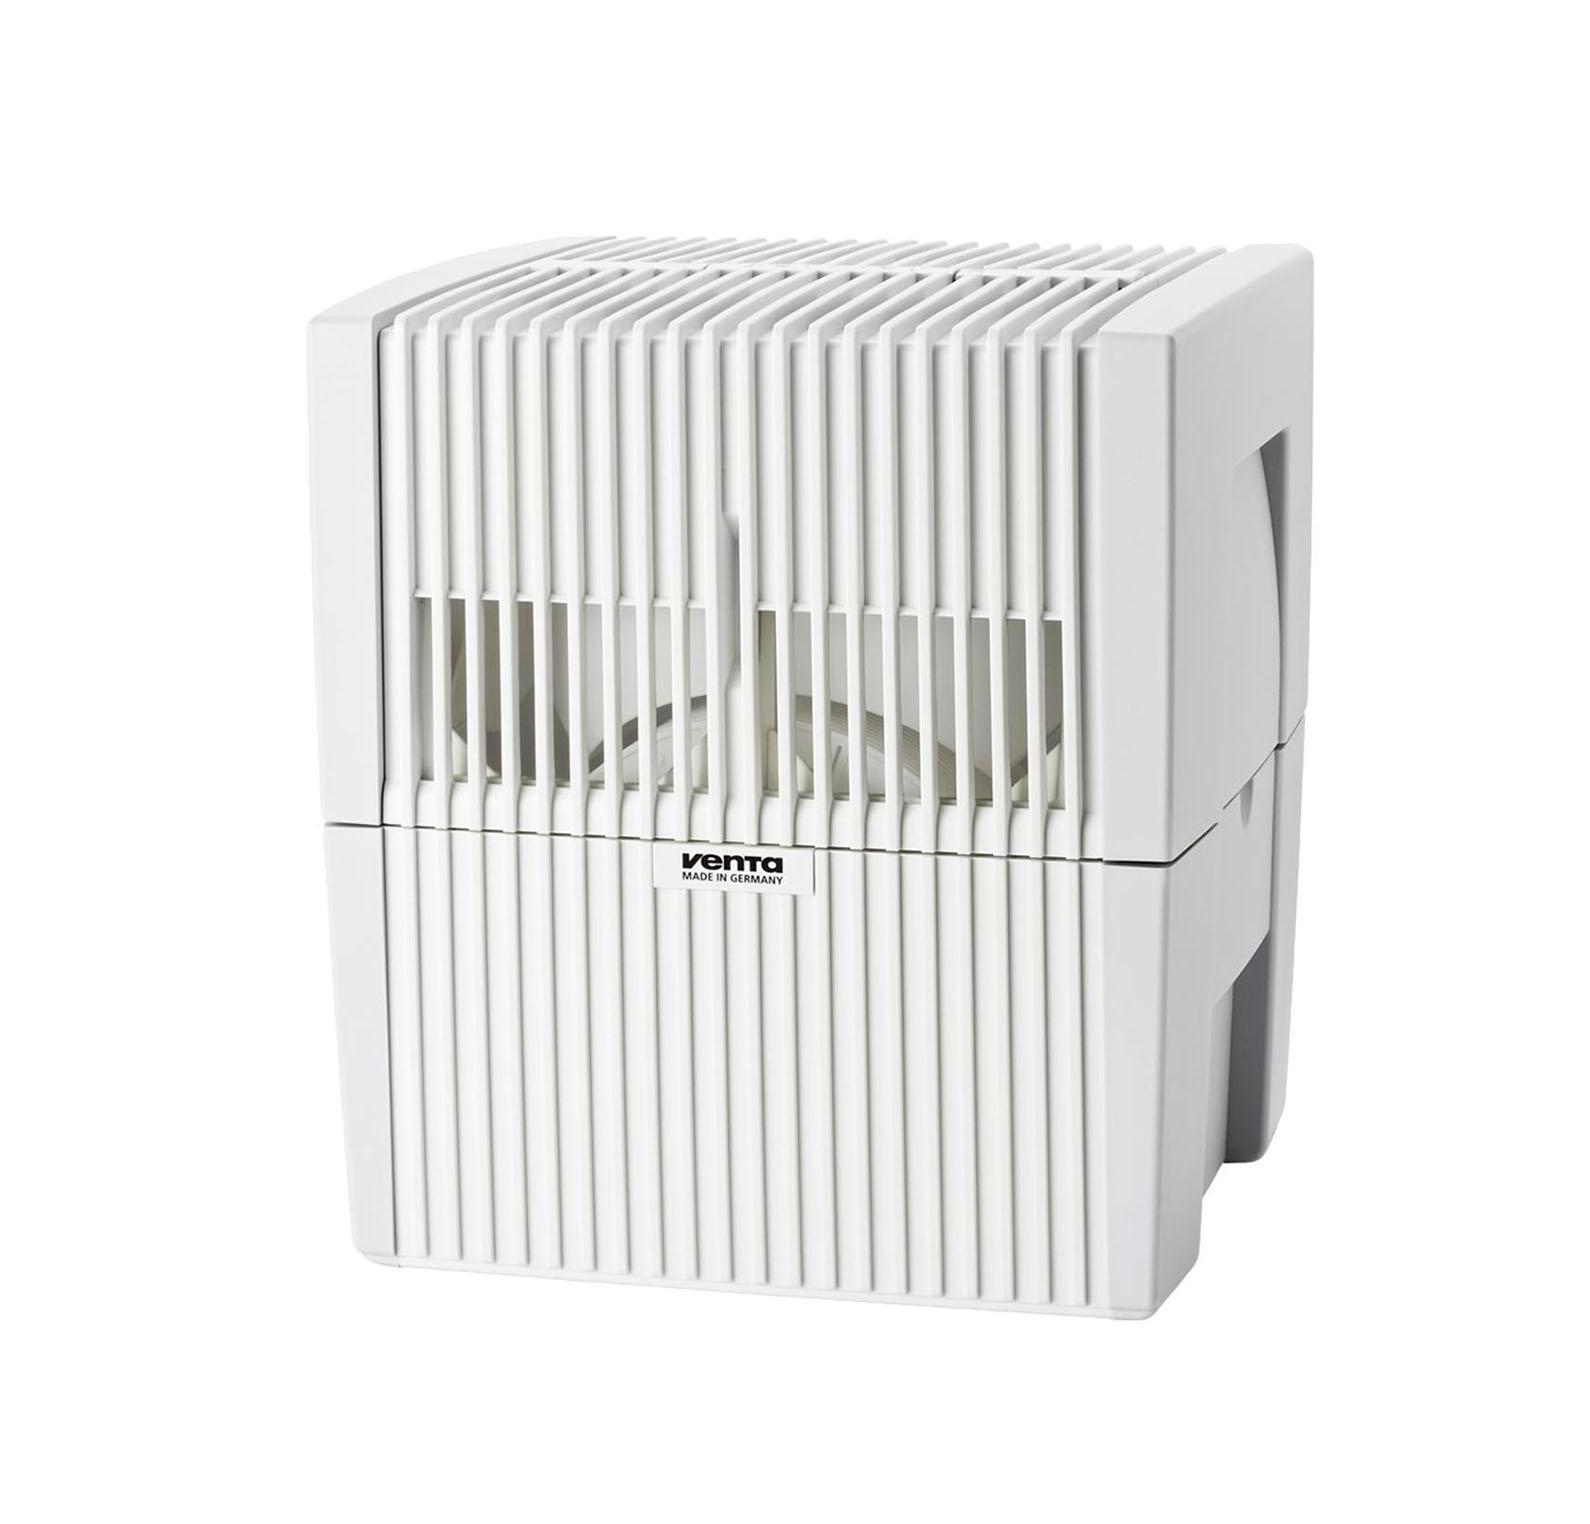 Venta LW 25, White Мойка воздуха venta сливки в москве